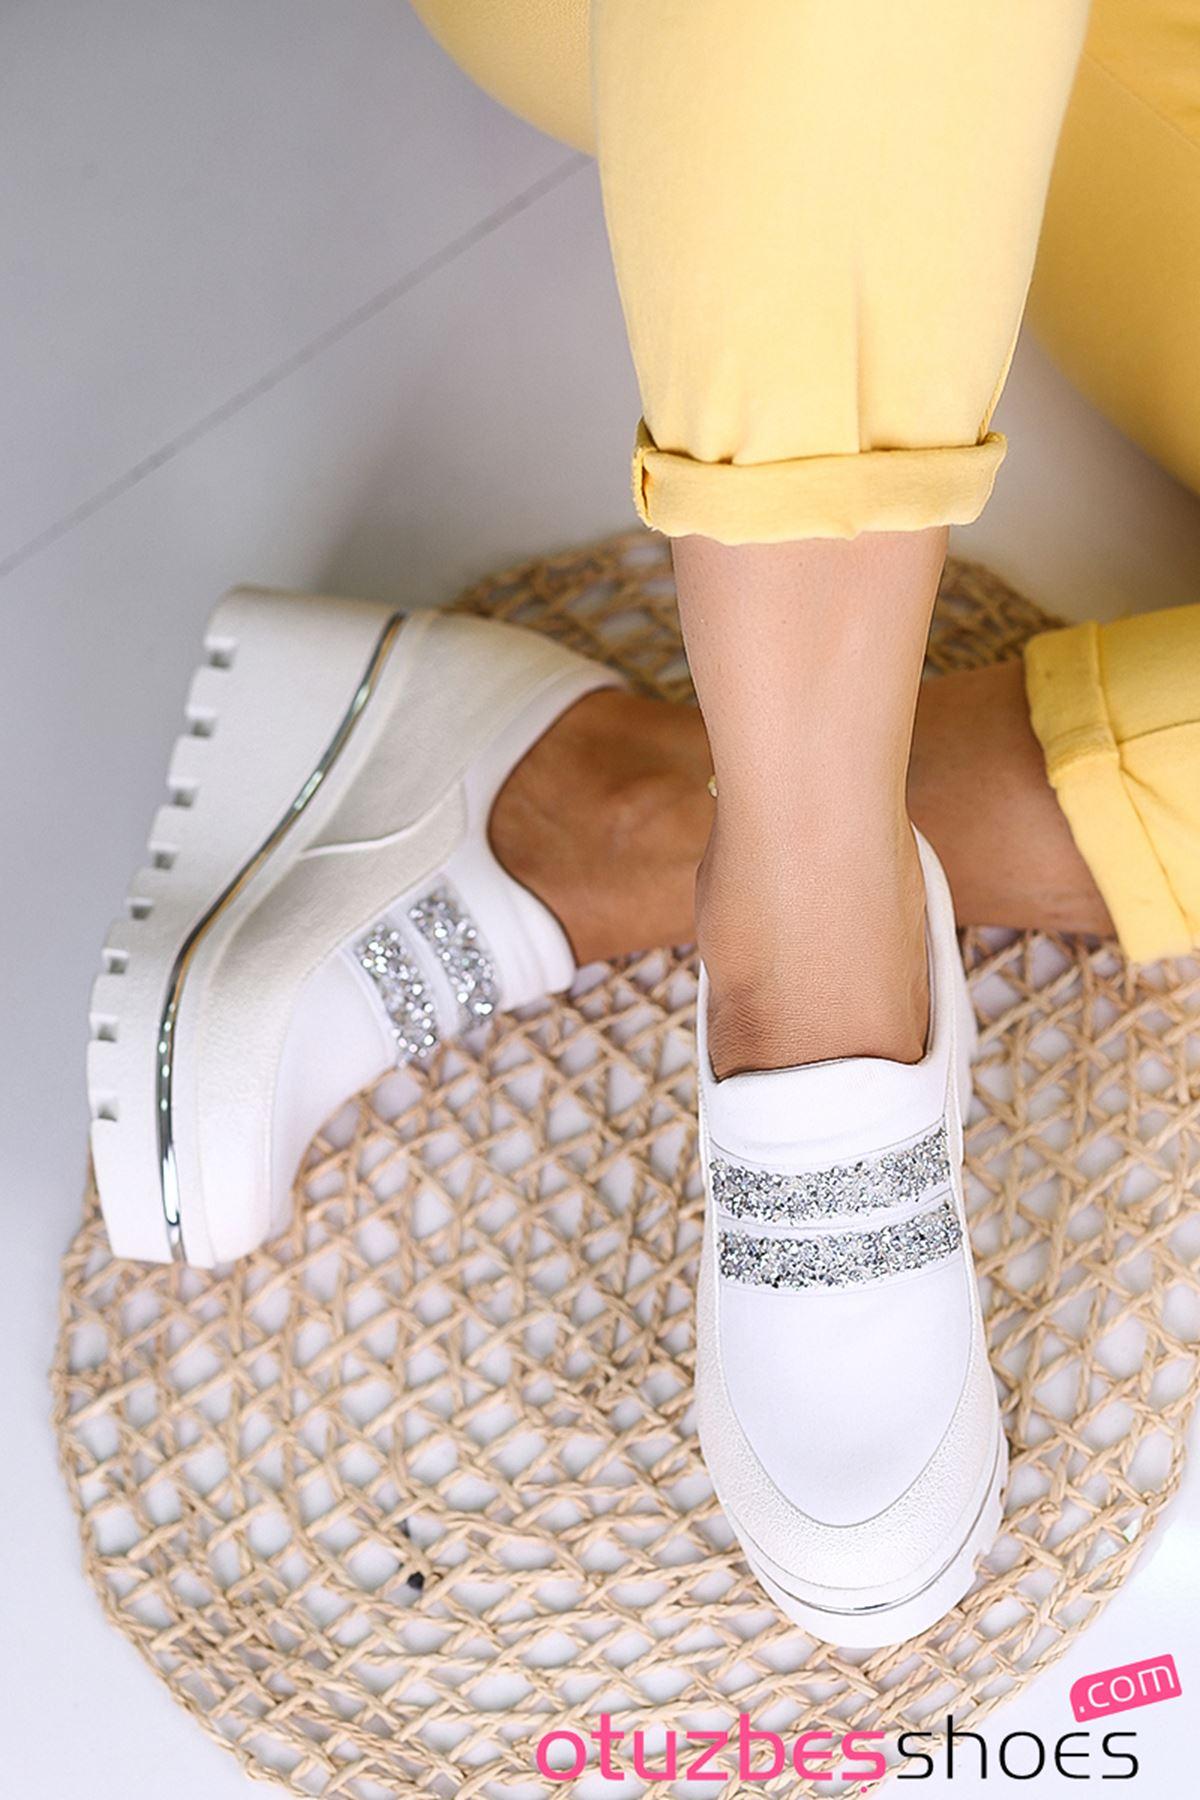 Olivia Taş Detay Lastik Dolgu Topuk Ayakkabı Beyaz